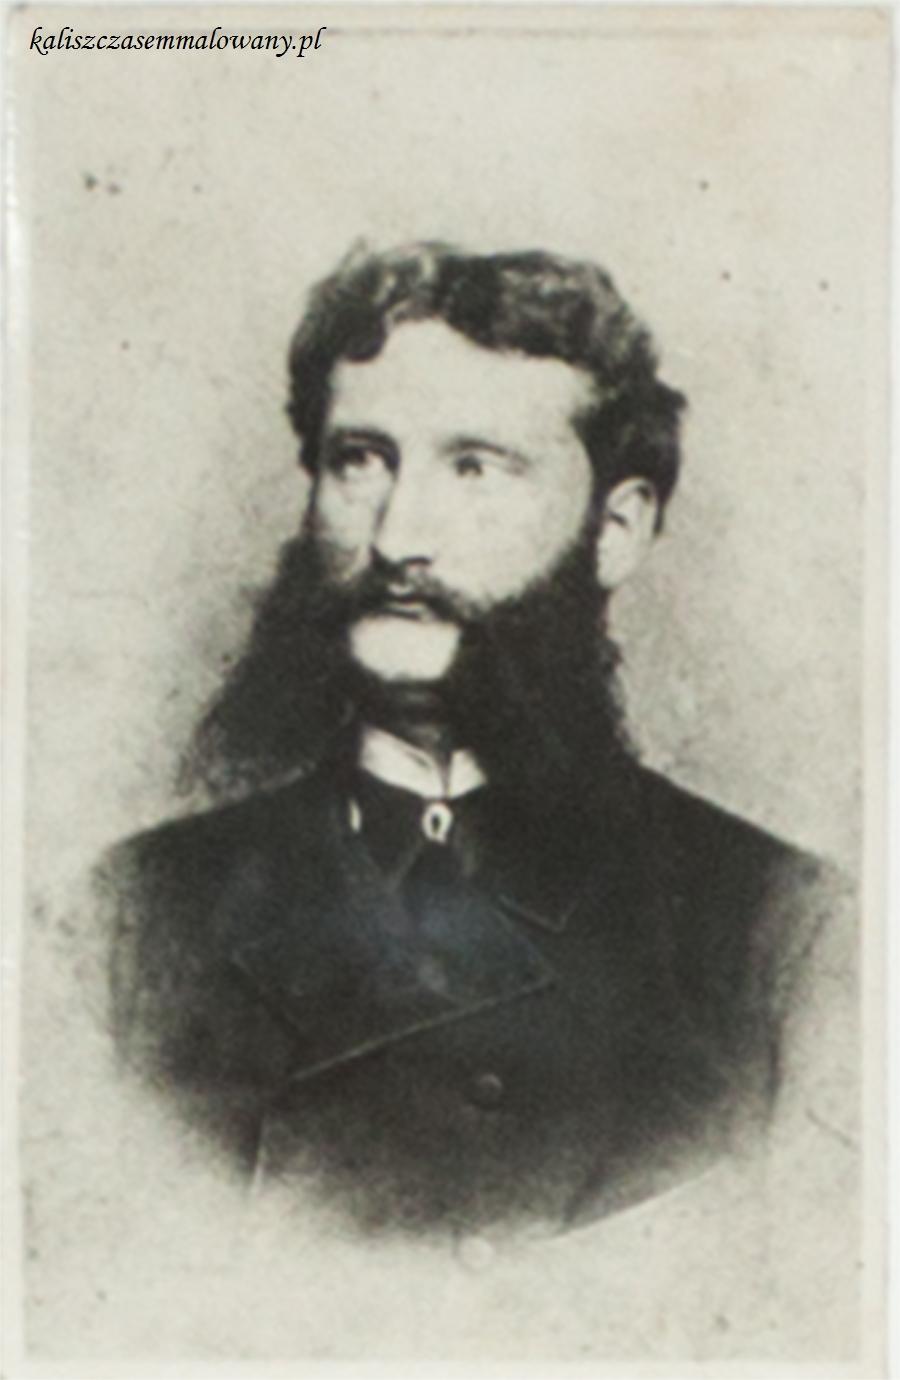 02-Stefan Bronikowski prezes OSP 1906